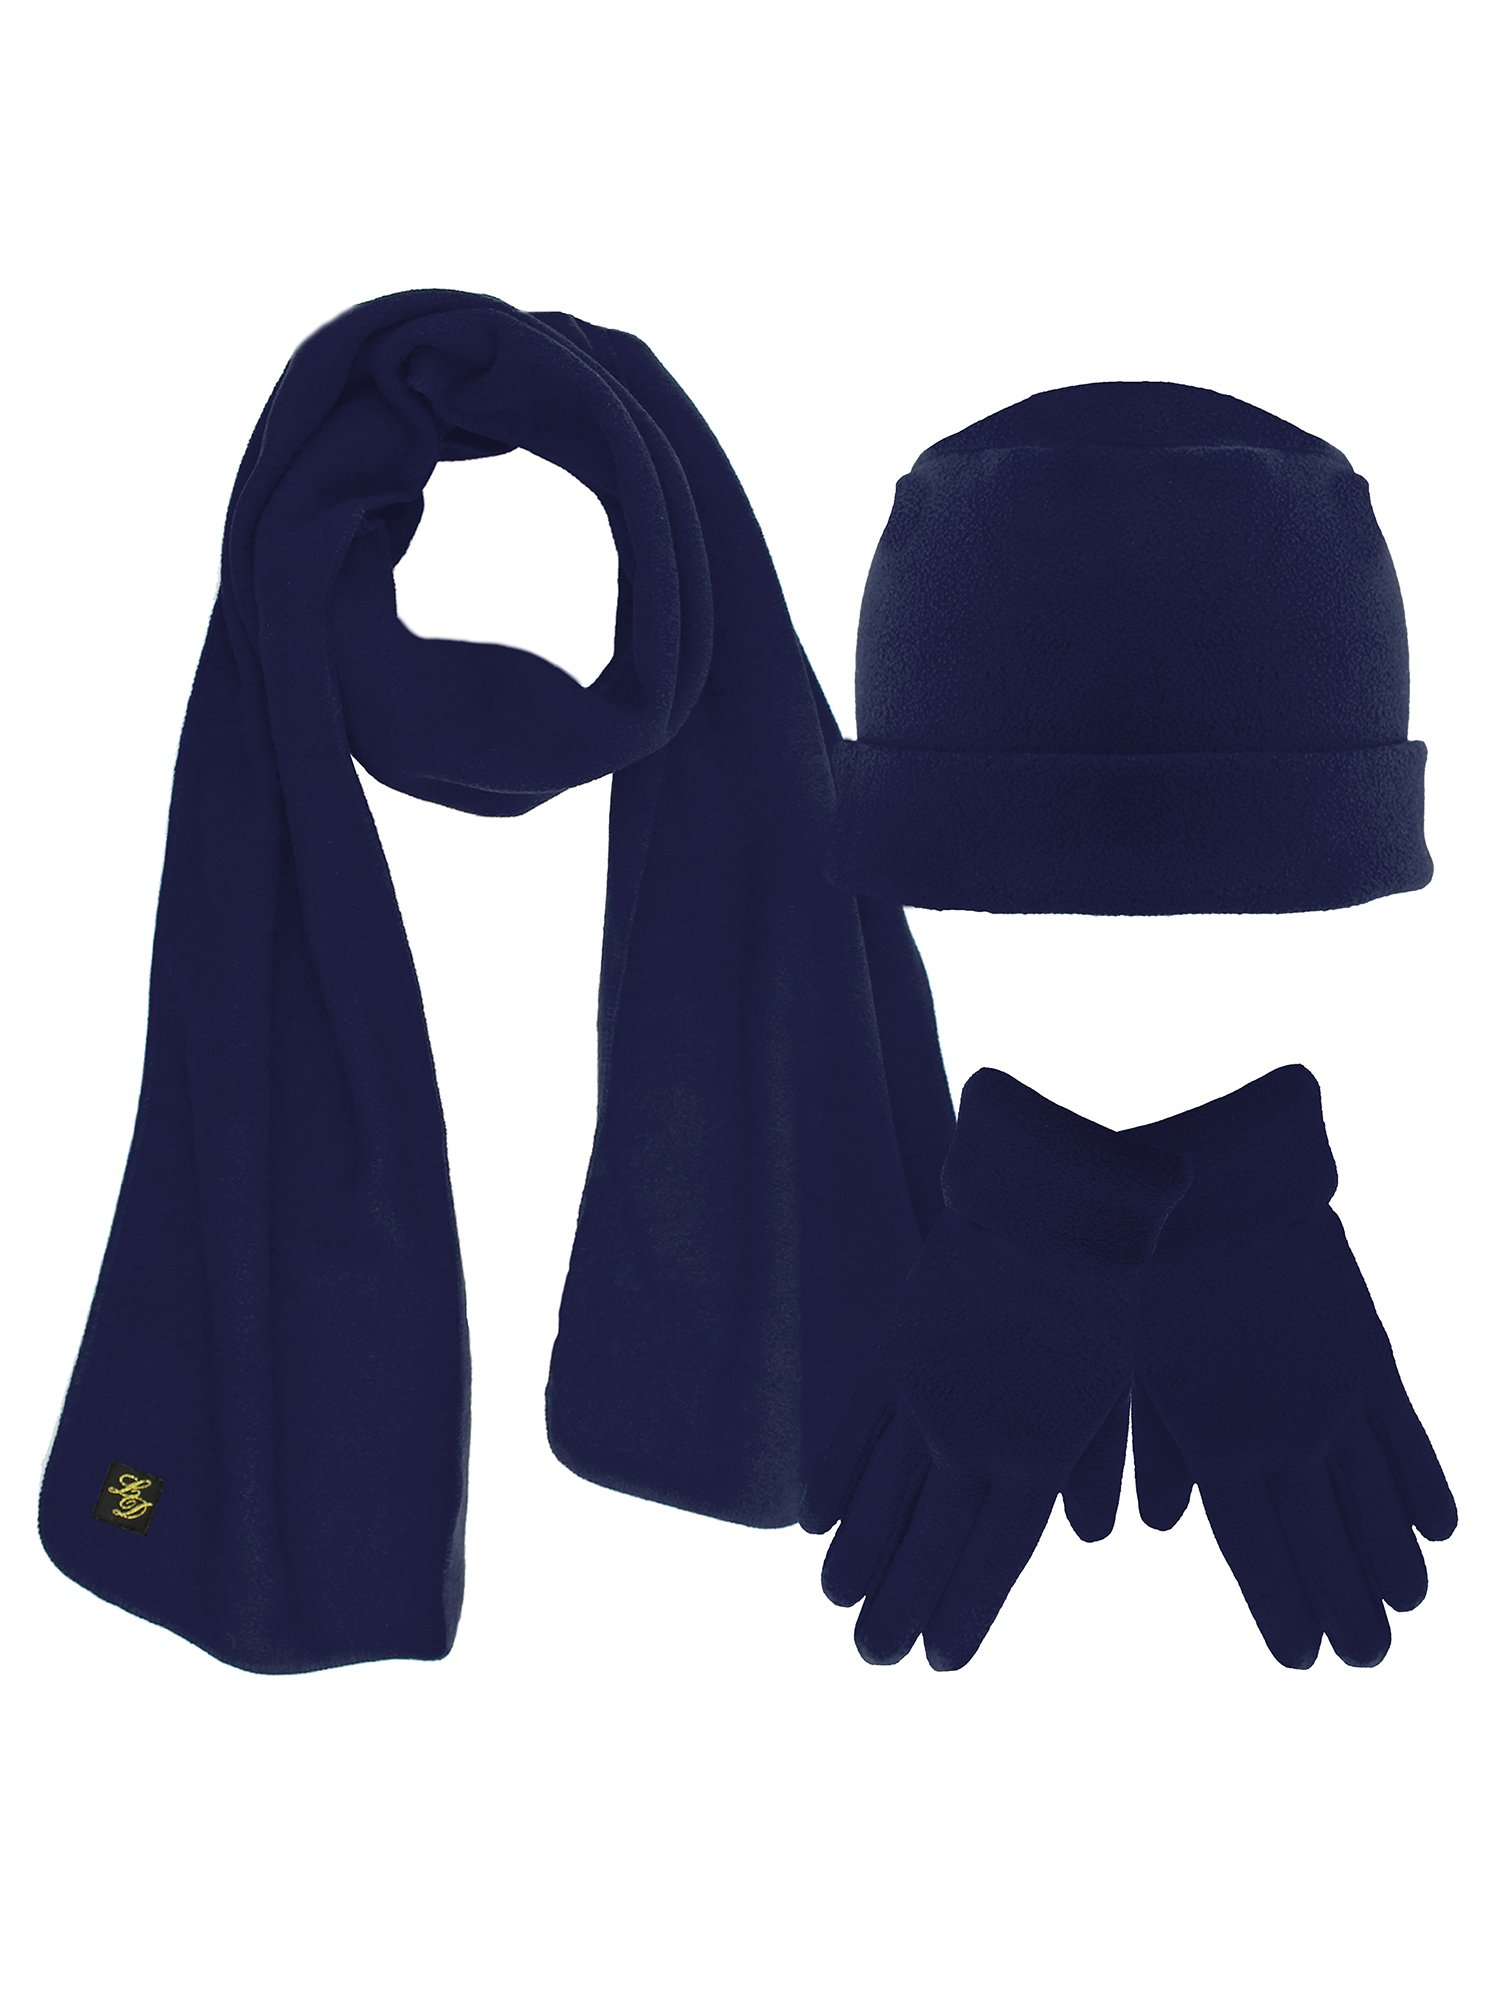 Navy Blue 3 Piece Fleece Hat Scarf & Glove Matching Set